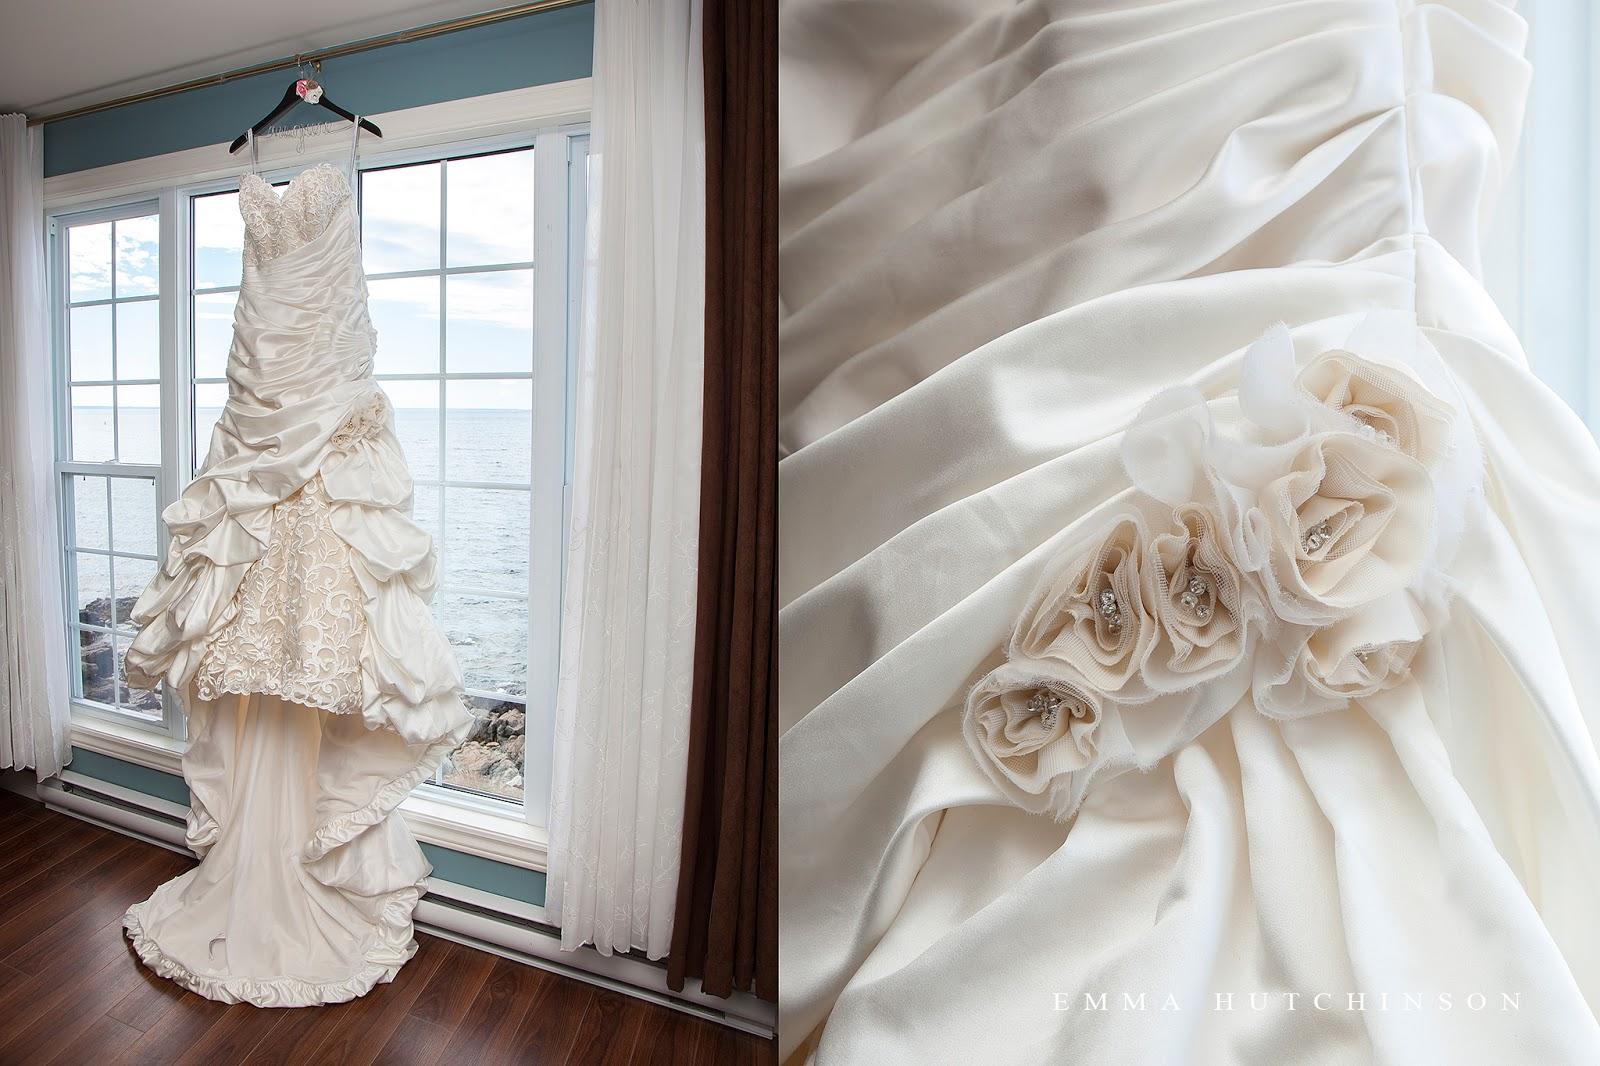 Weddings in Tilting, Fogo Island - photograph of wedding dress